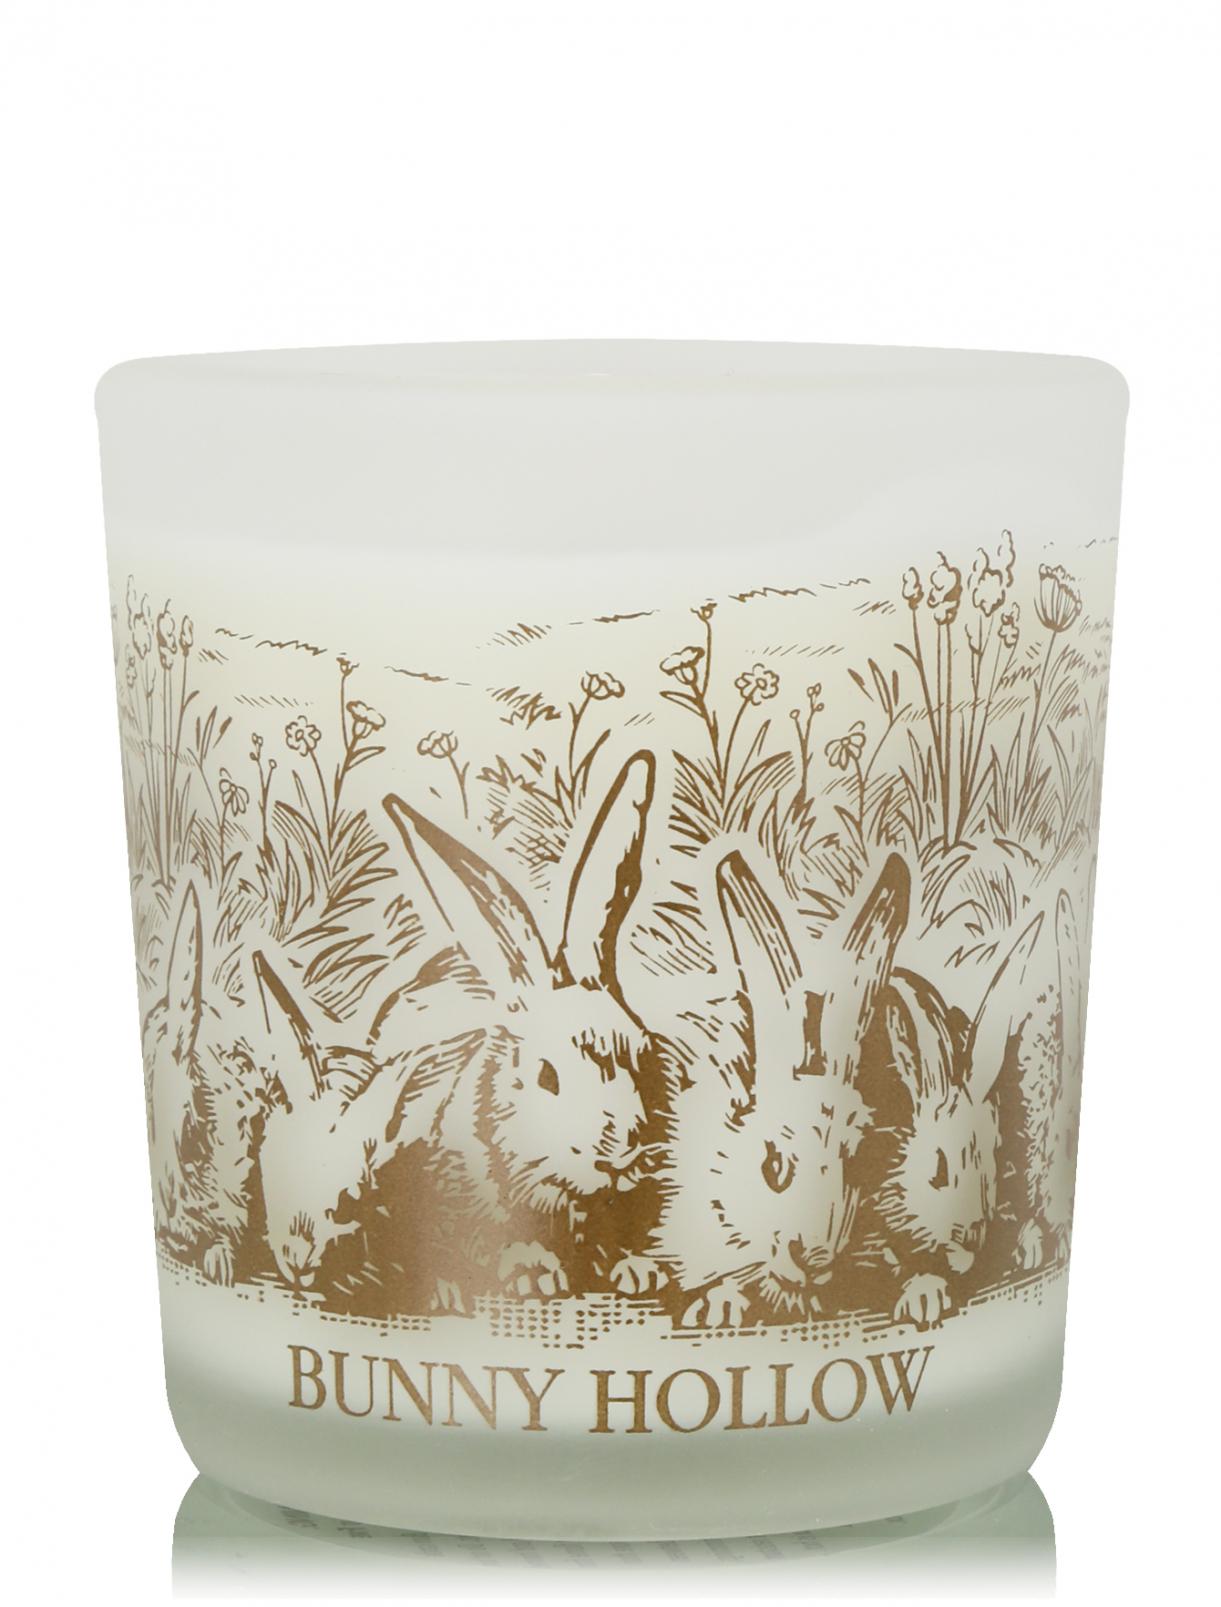 Свеча в подарочной коробке Bunny Hollow 8х8х10 см MichelDesignWorks  –  Общий вид